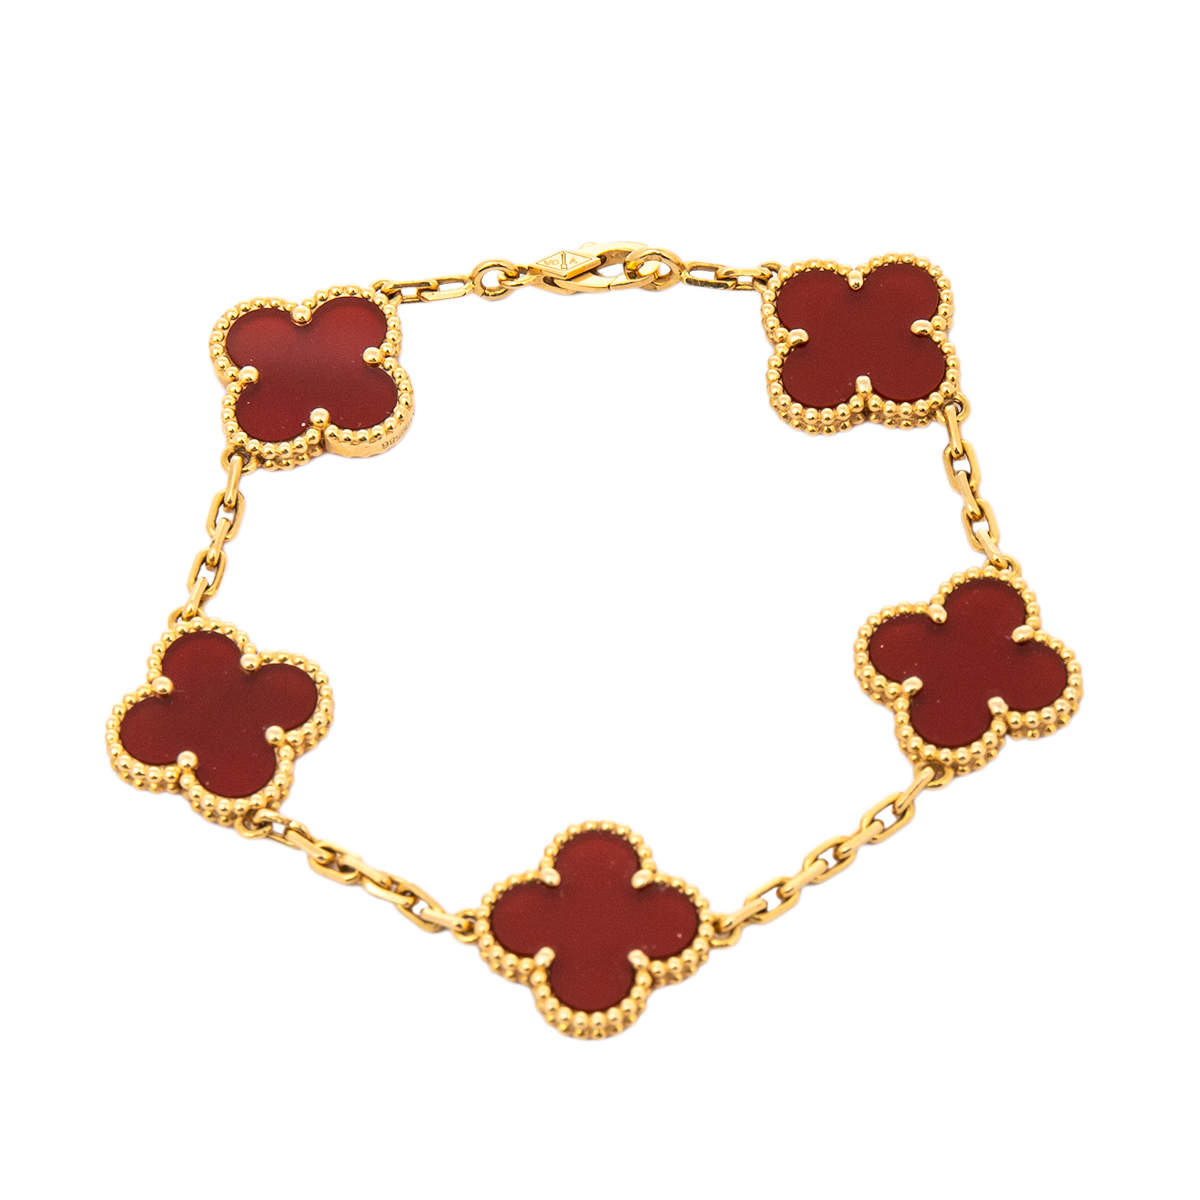 Van Cleef & Arpels Vintage Alhambra Carnelian 18K Yellow Gold Station Bracelet